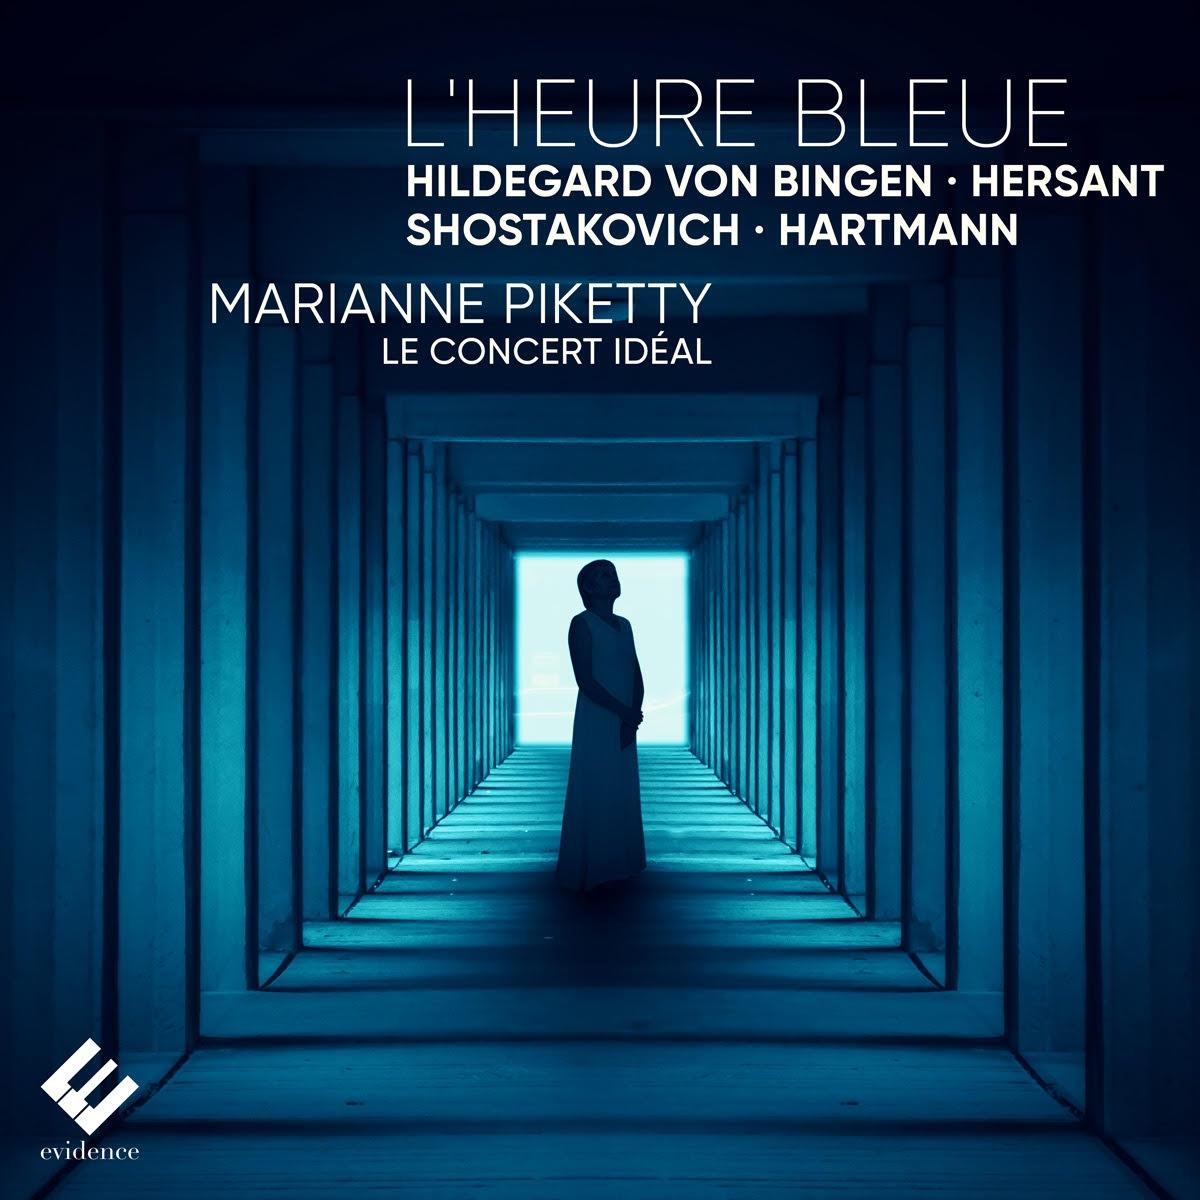 l'heure bleue marianne piketty concert idéal disque